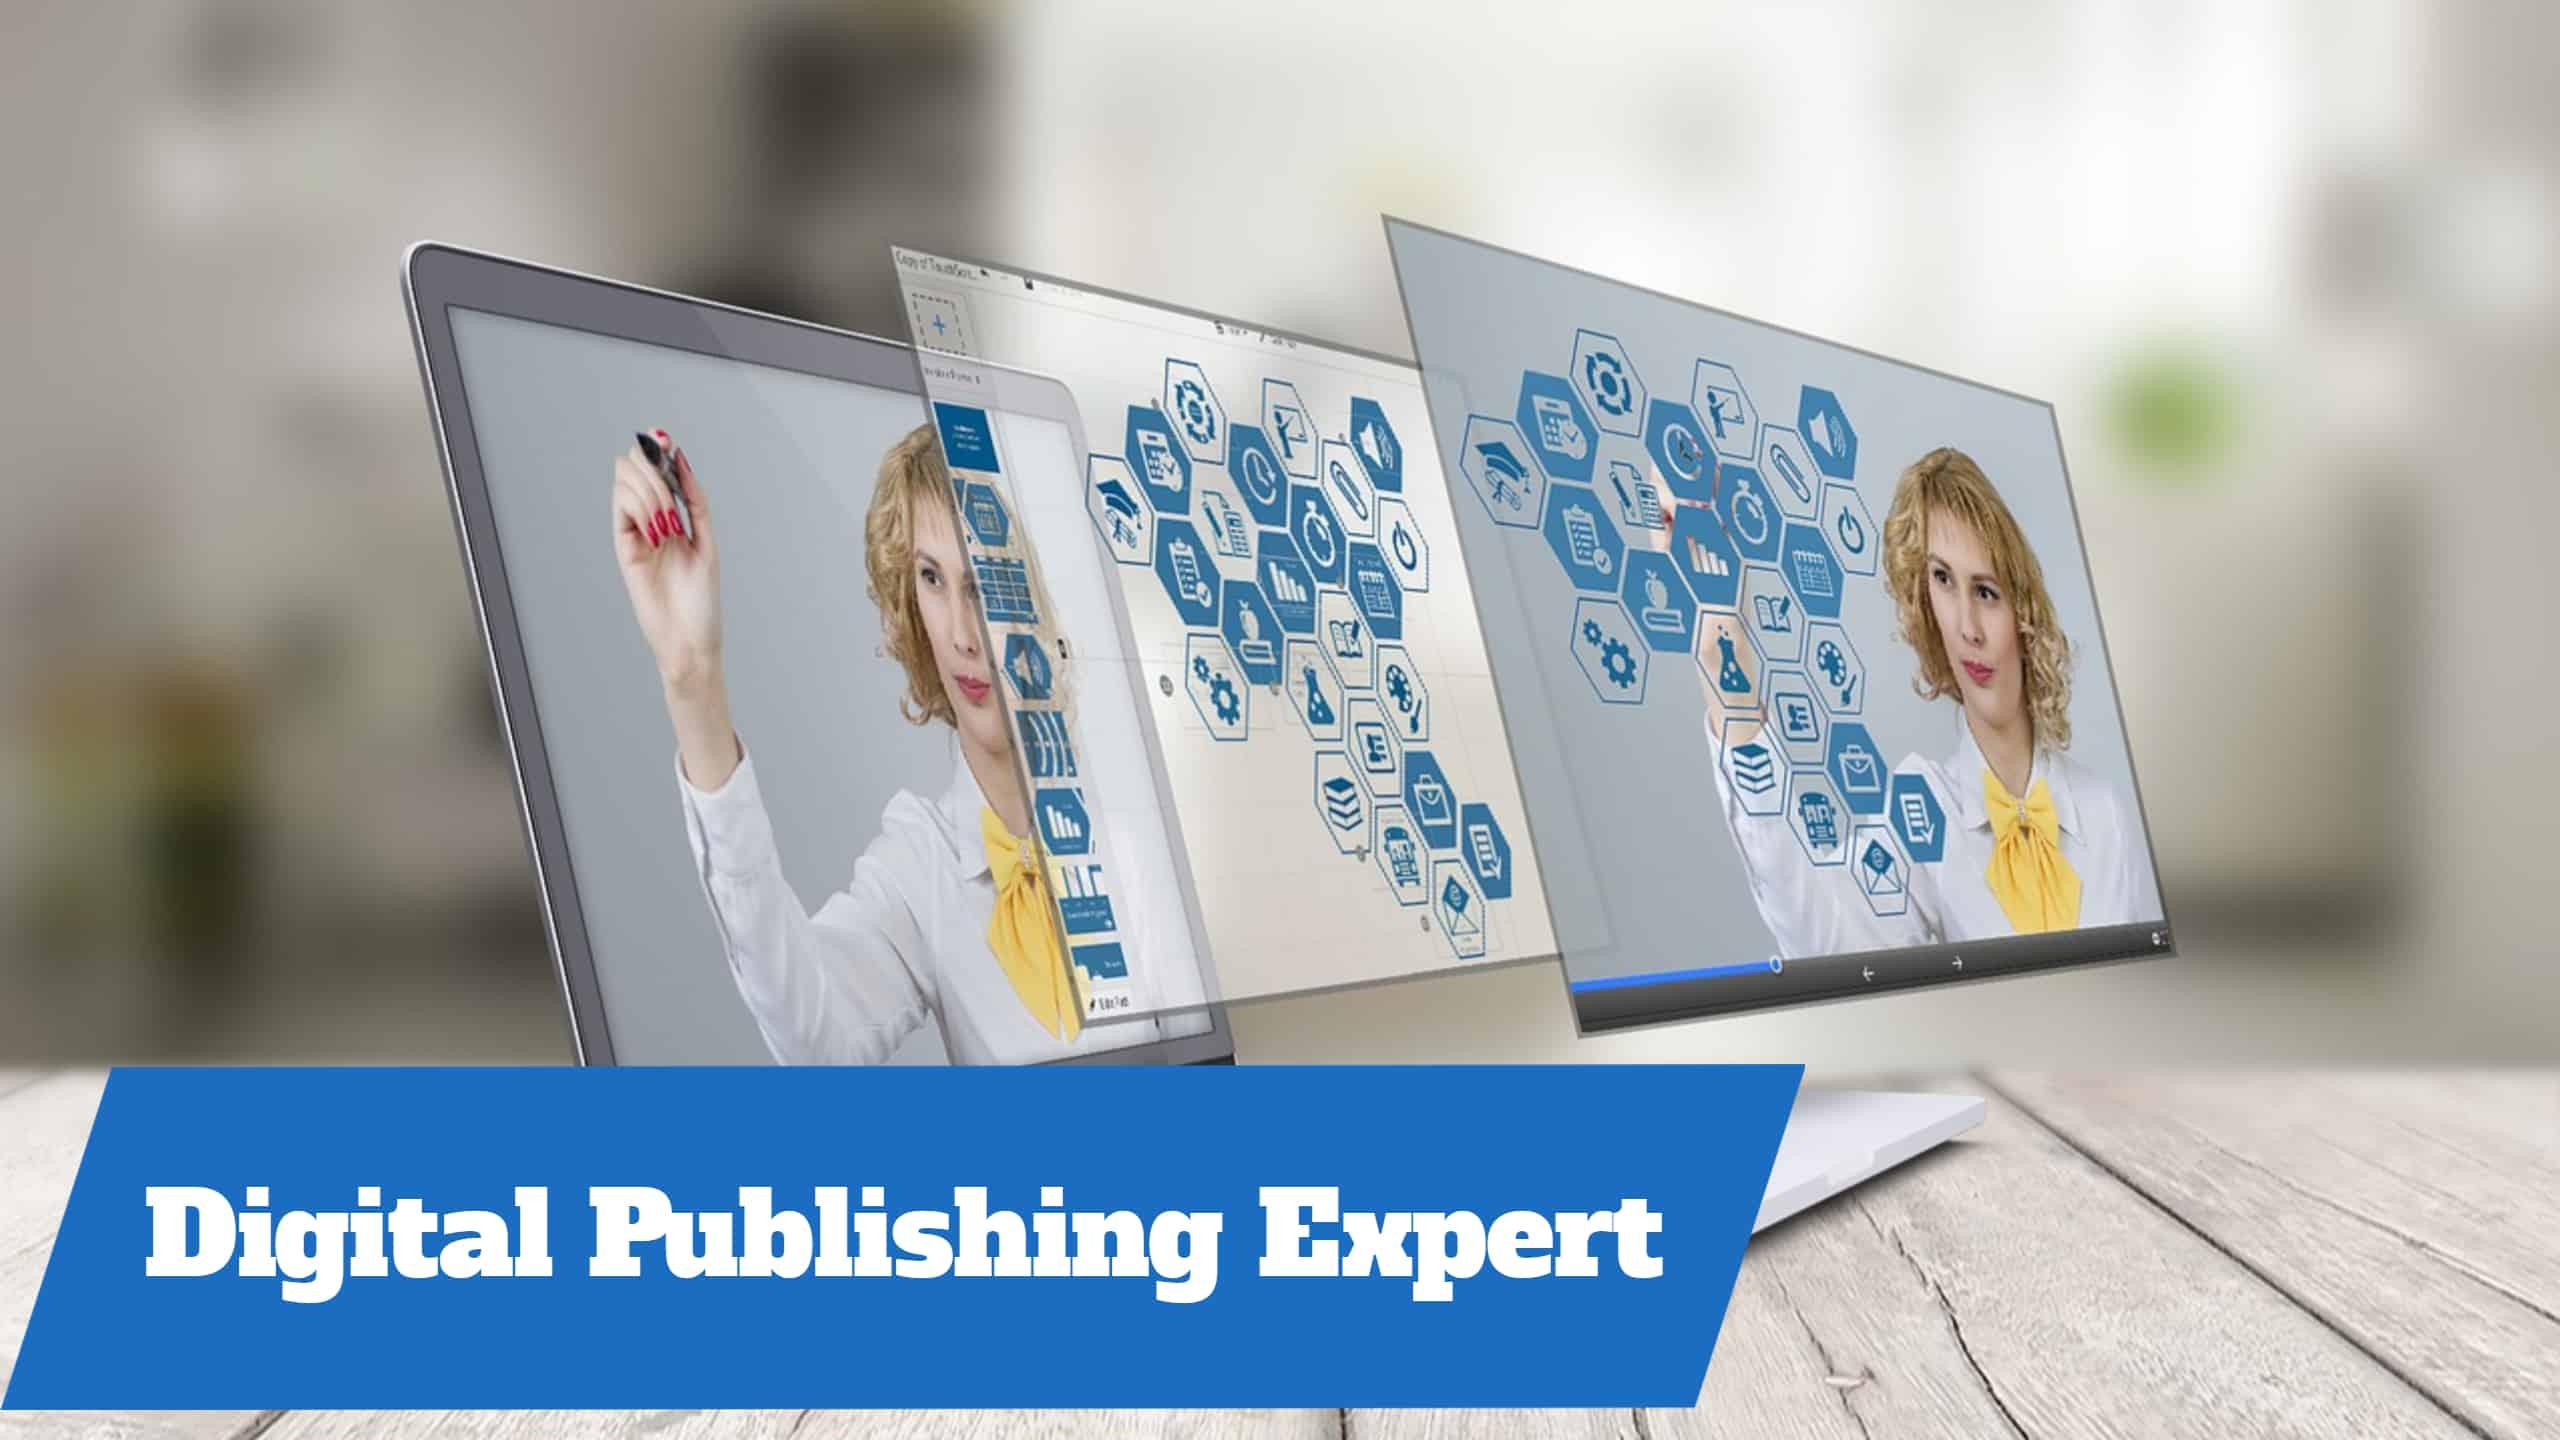 Digital Publishing Expert